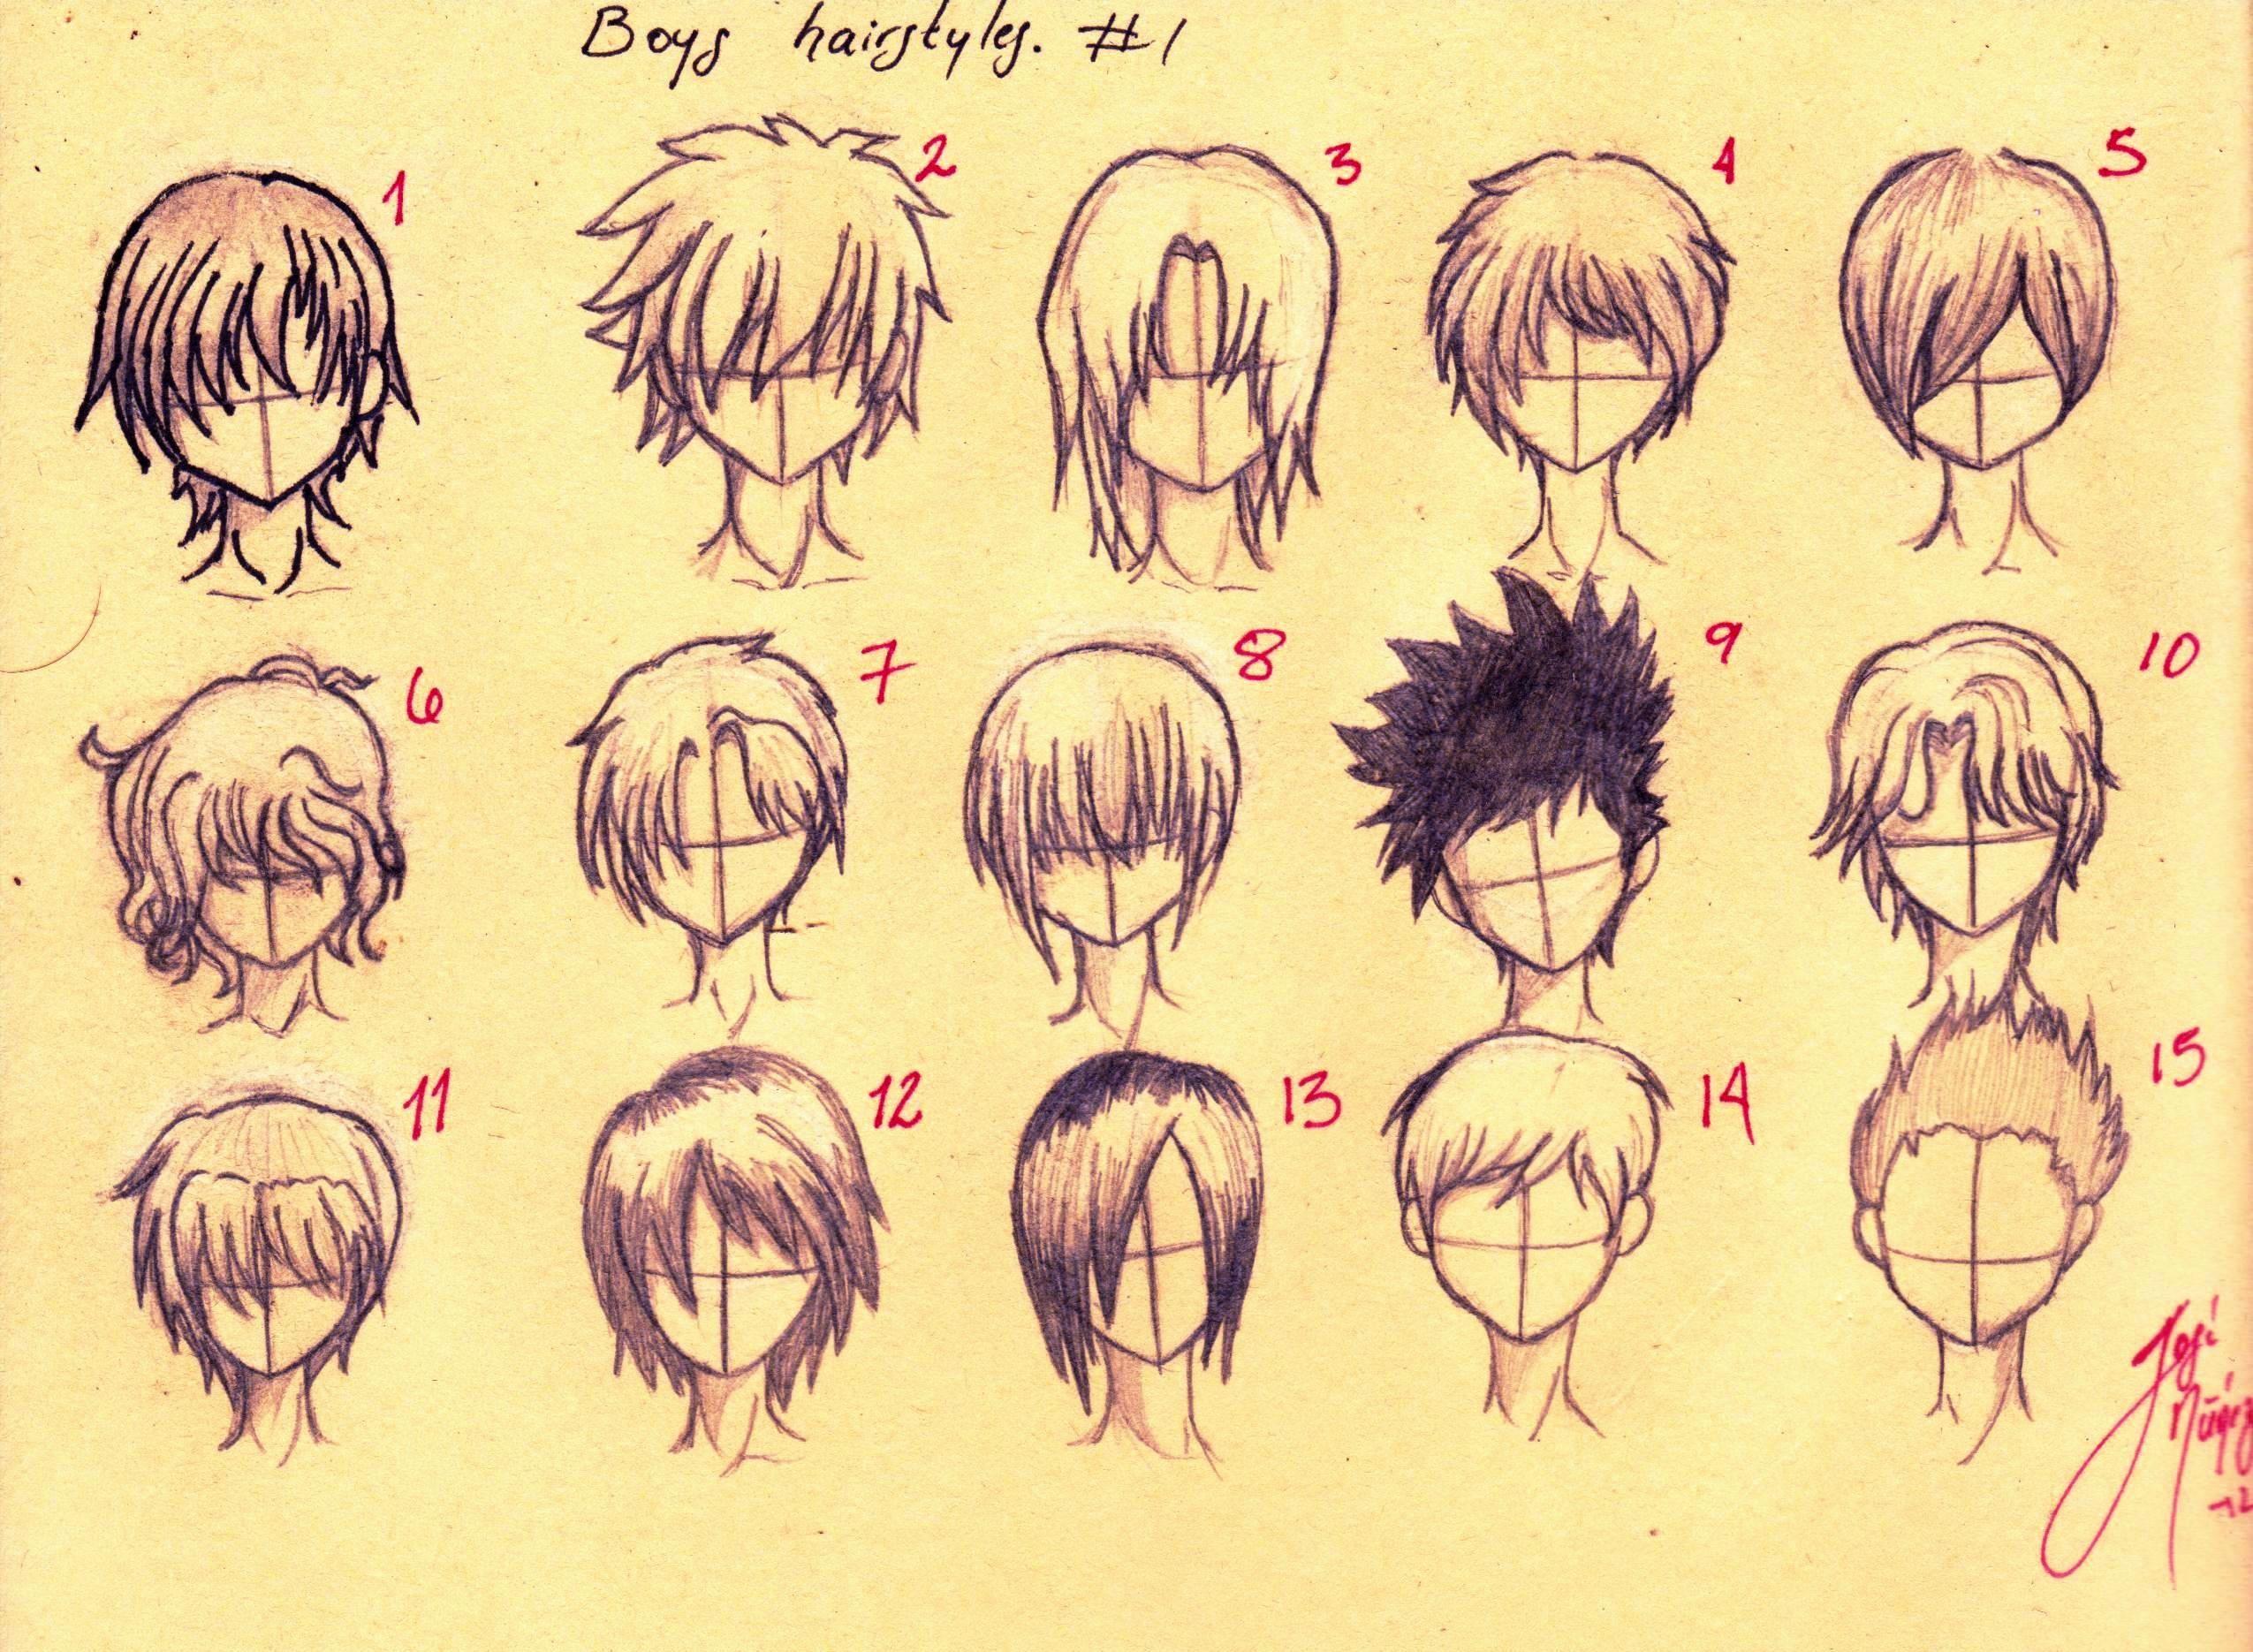 Anime Hairstyles For Boys Tutorial By Josen16 On Deviantart